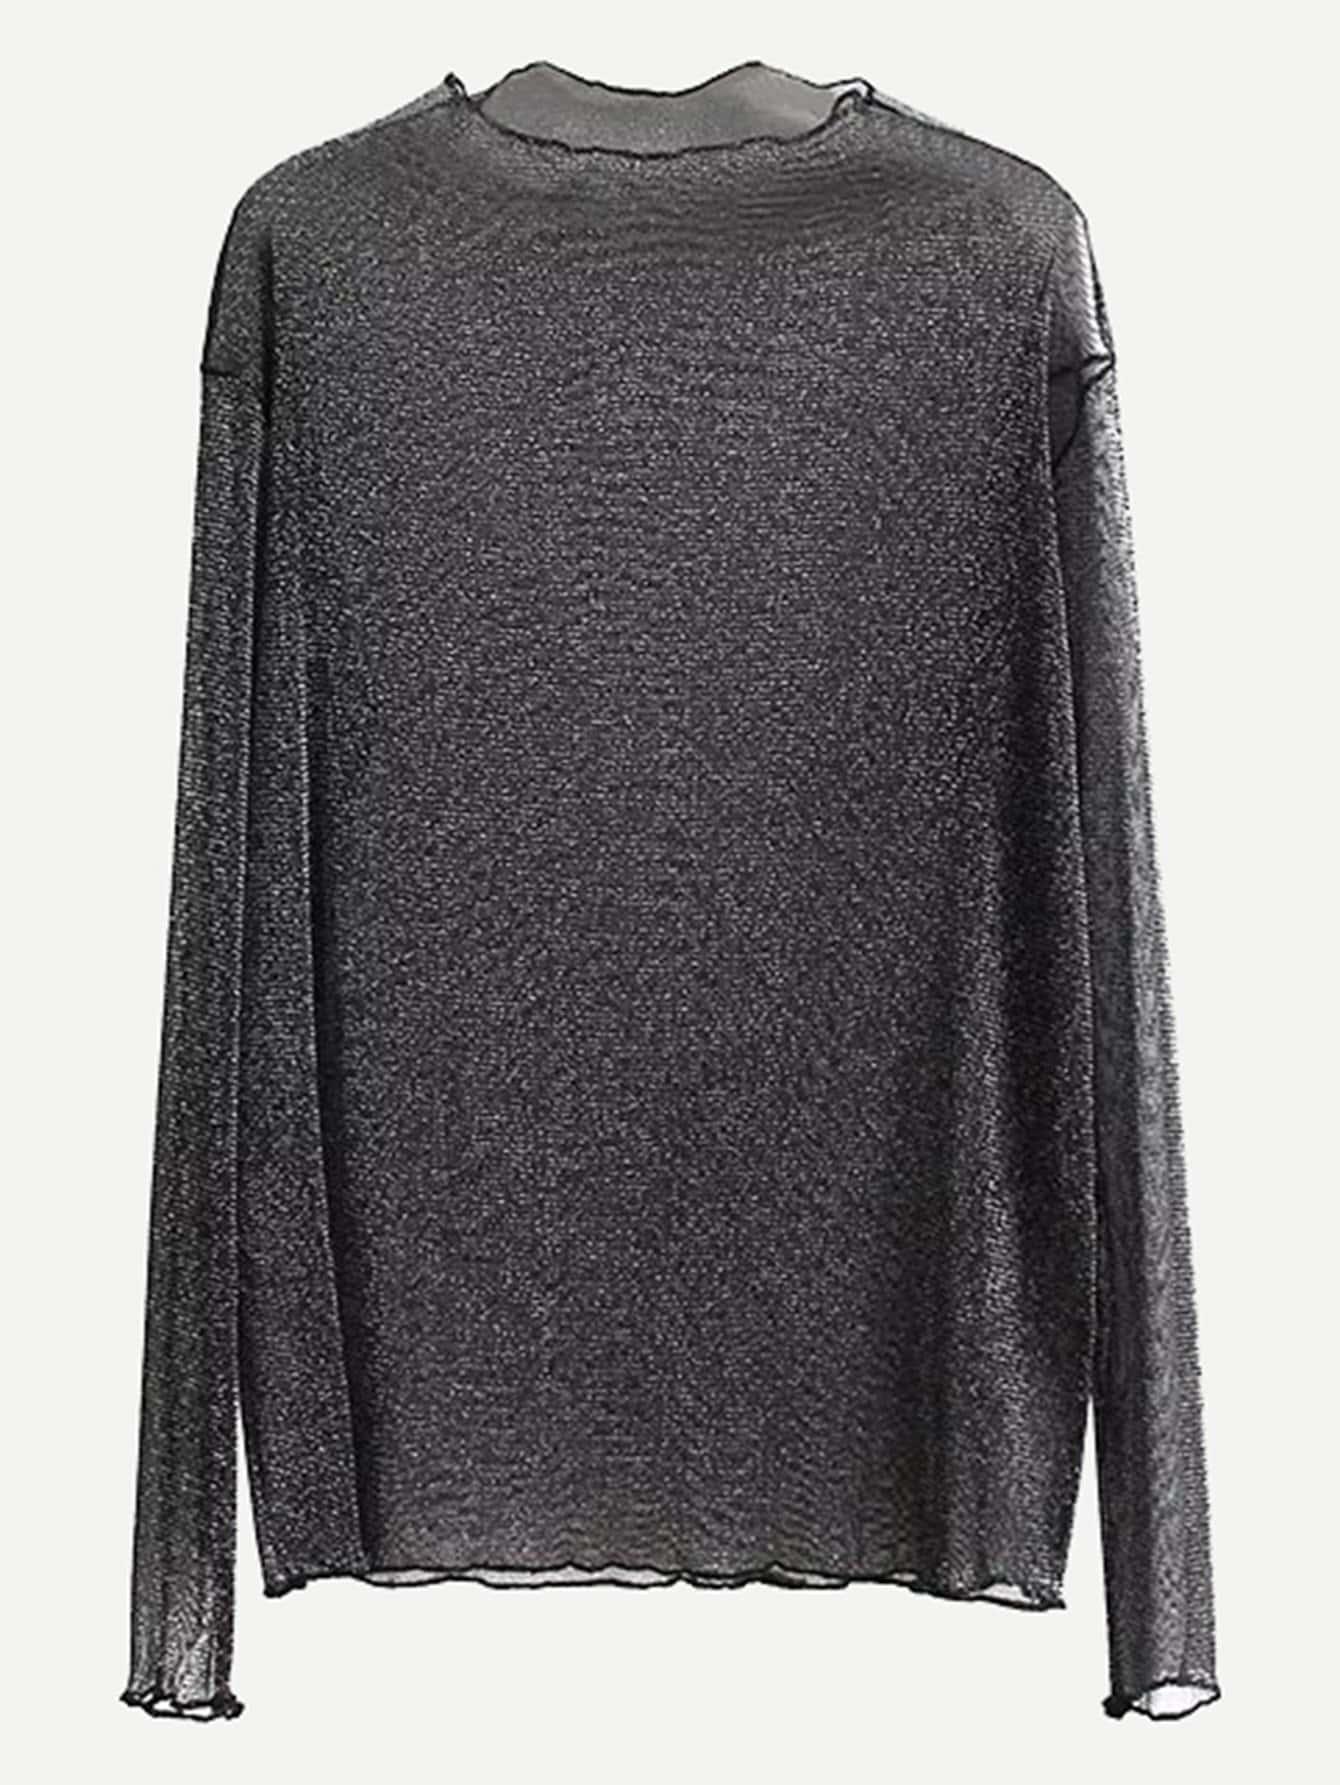 Купить Простая прозрачная блузка, null, SheIn